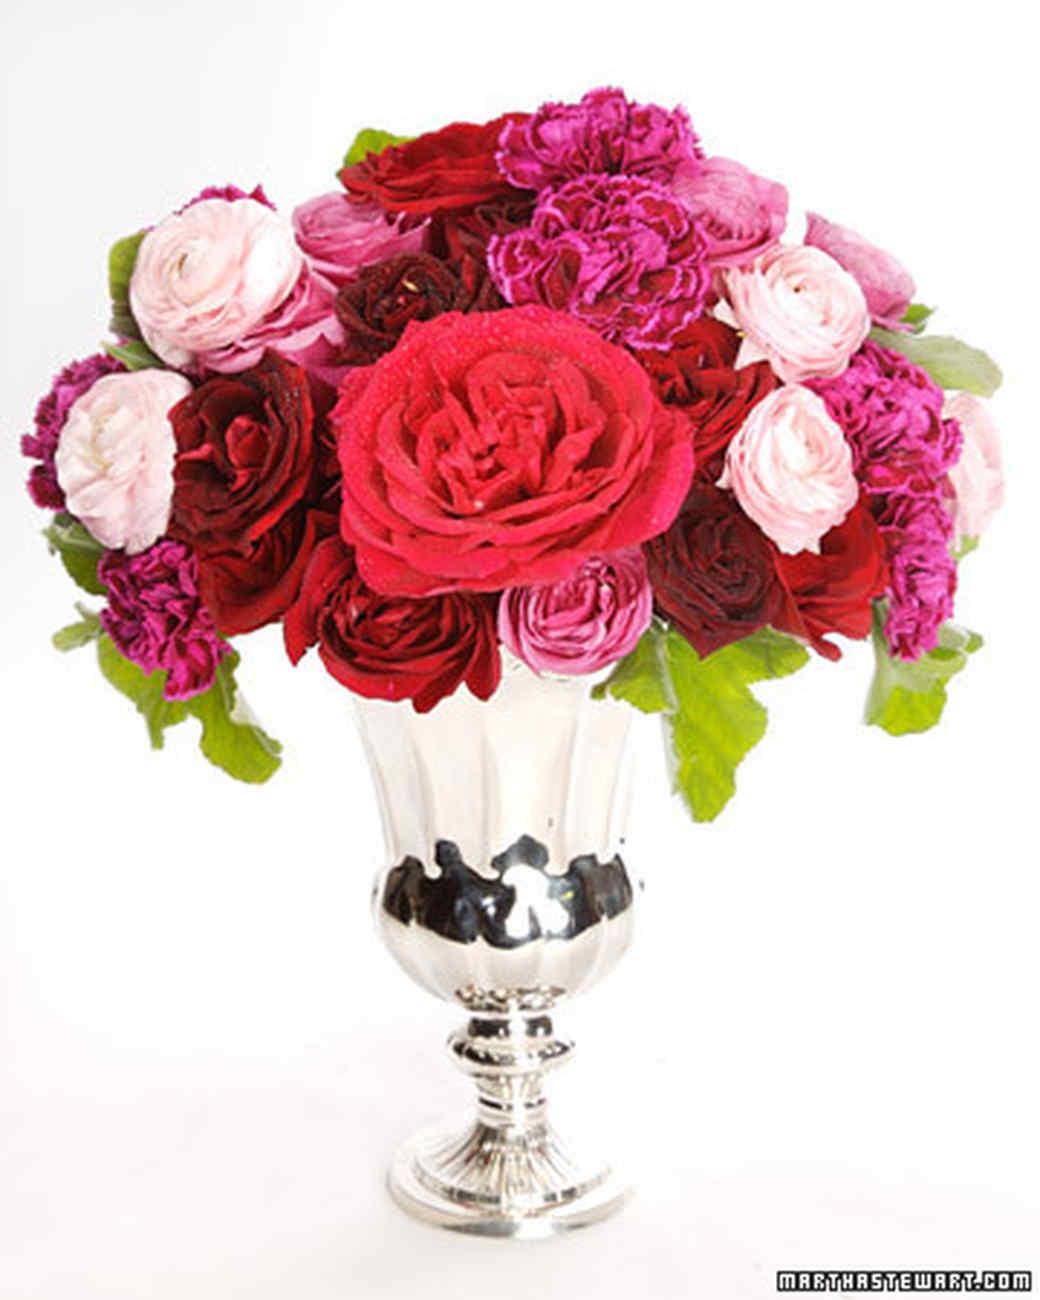 3104_020508_valentinearrang.jpg